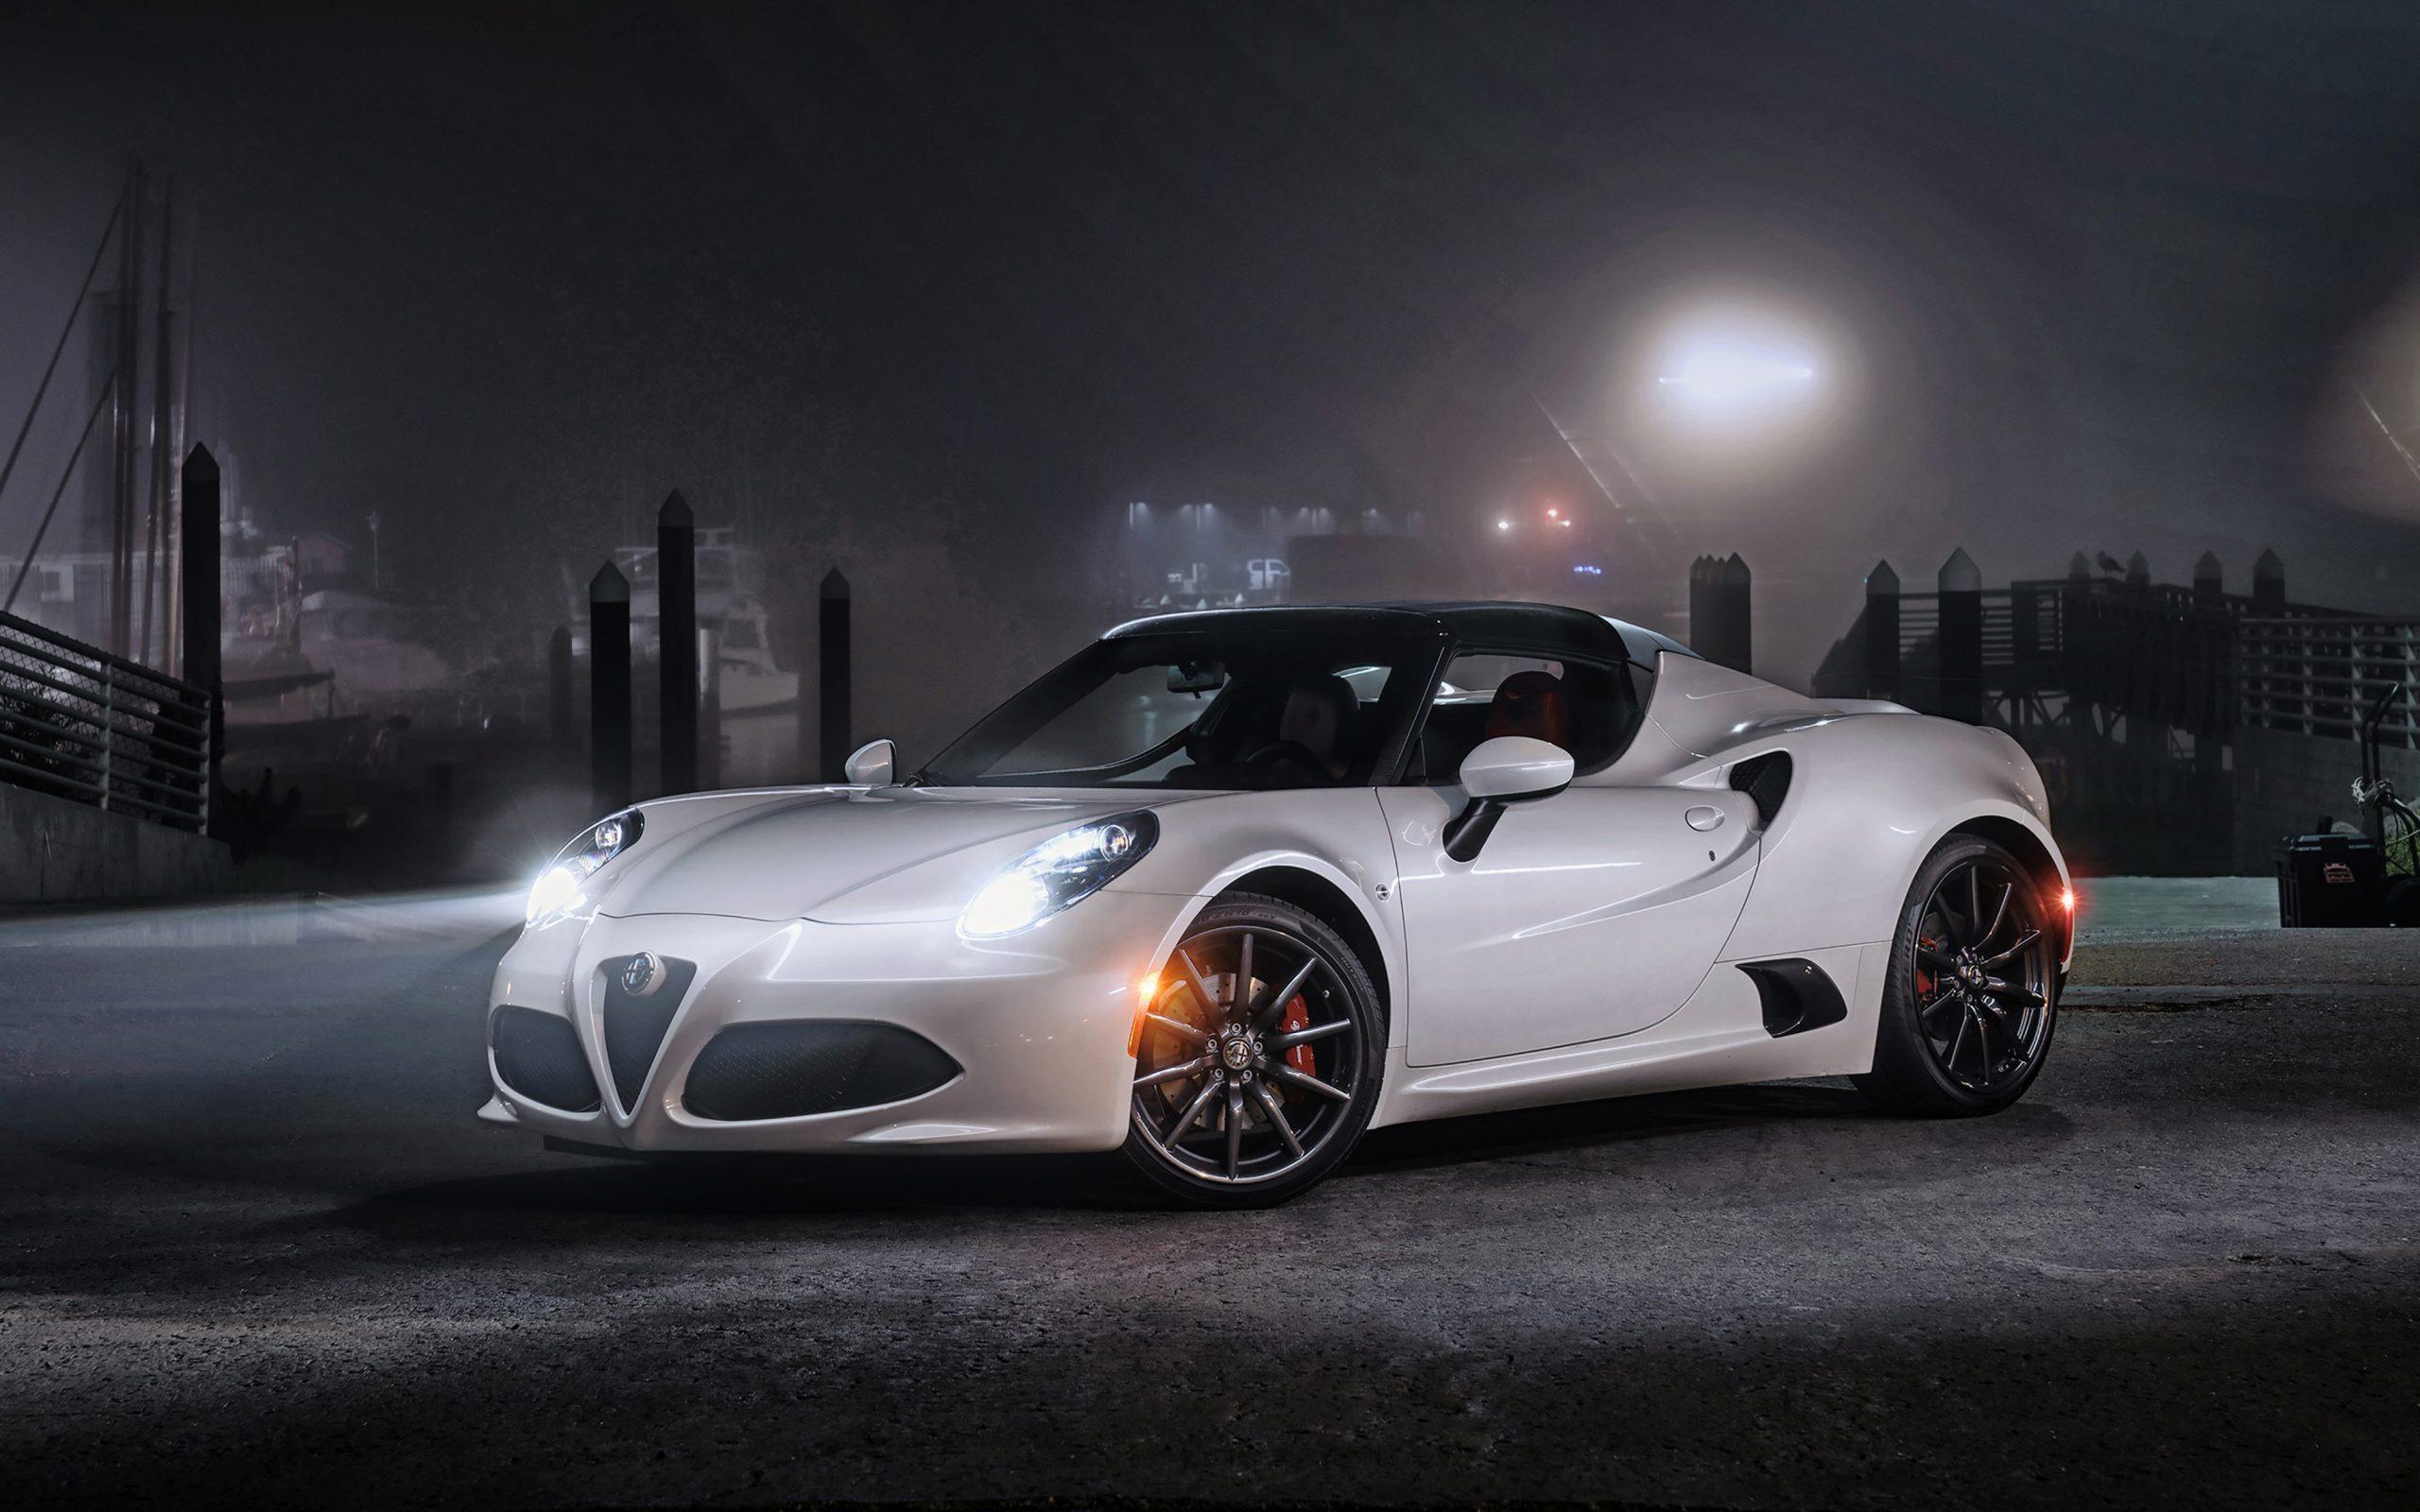 Popular Wallpaper Night Car - car-sport-car-white-night-4k-wallpaper-2560x1600  Pic.jpg